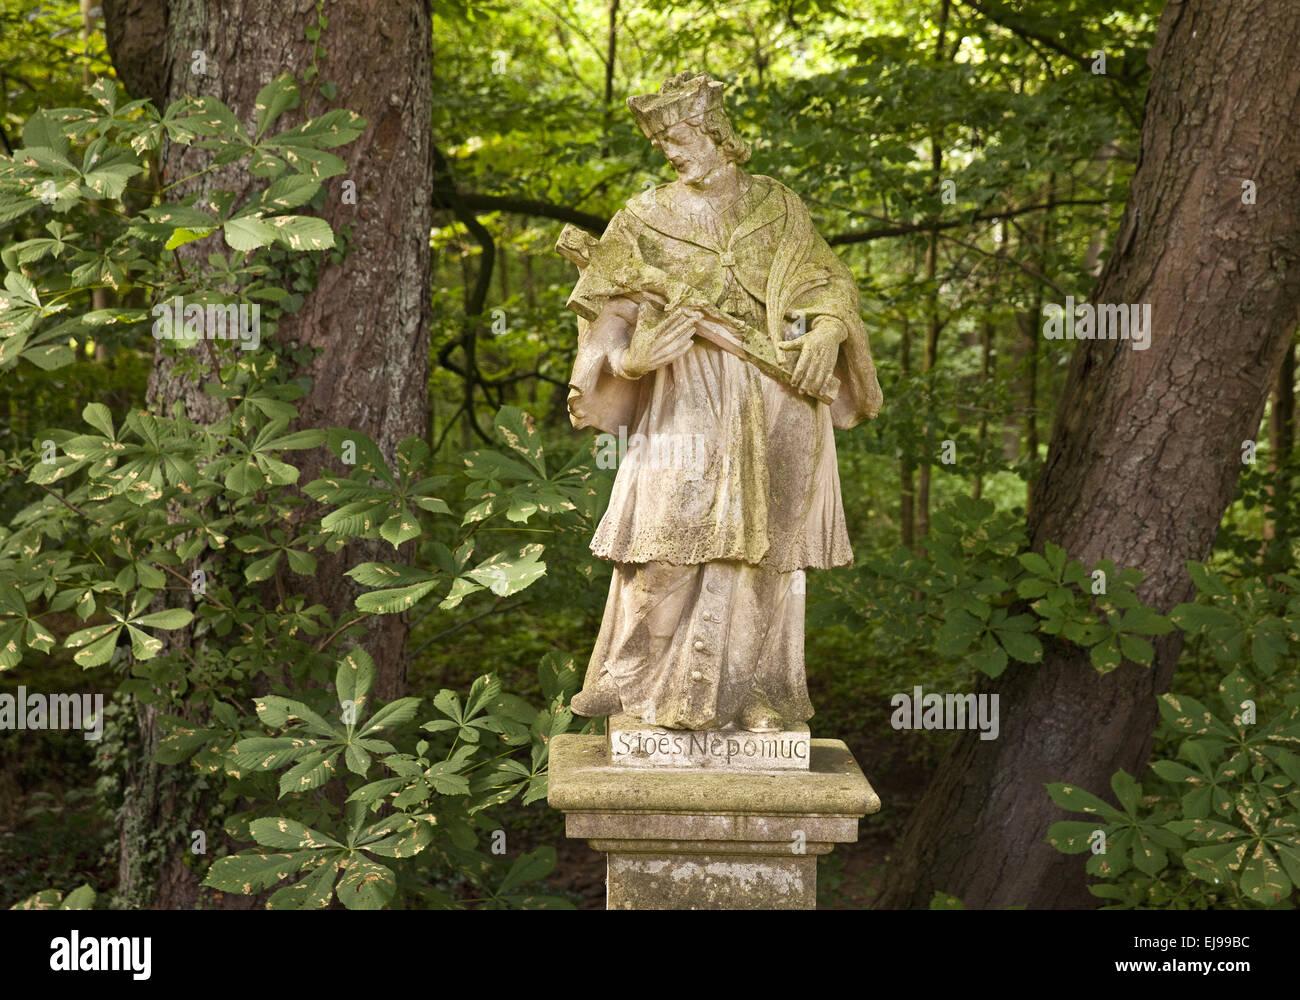 Estatua religiosa, Ochtrup, Alemania Imagen De Stock